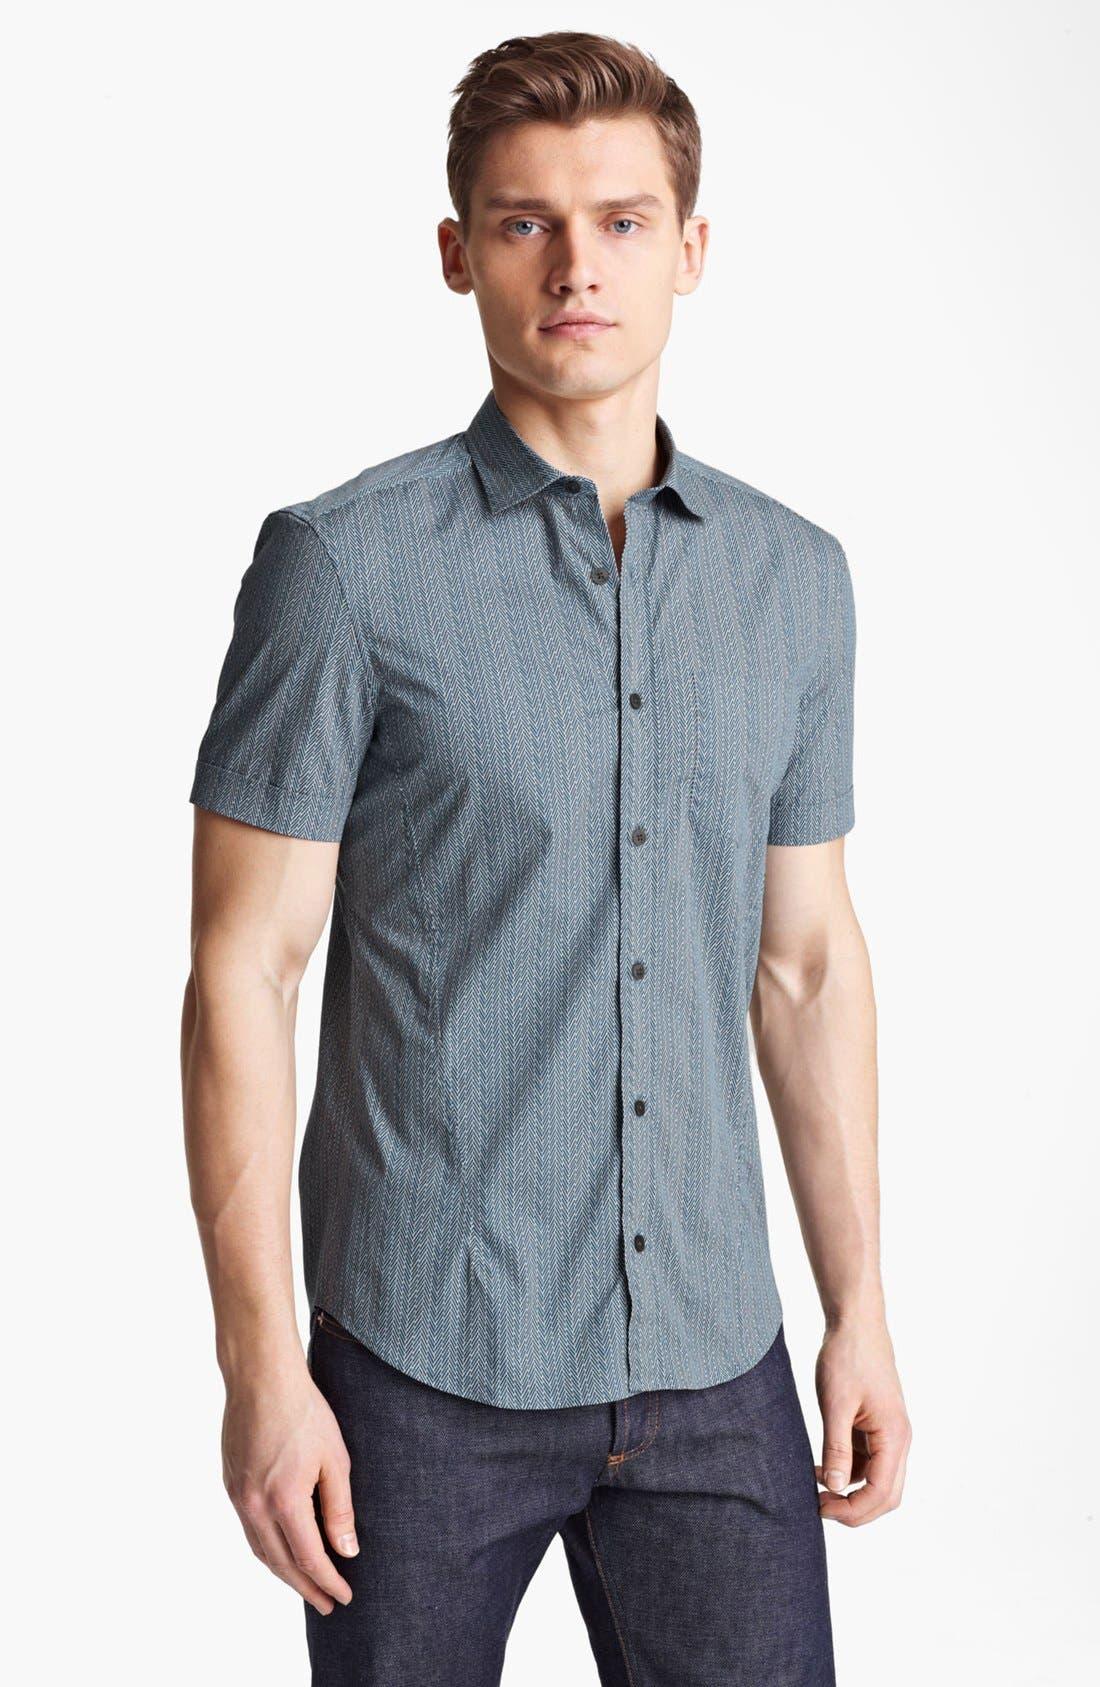 Alternate Image 1 Selected - Z Zegna Geometric Print Woven Shirt